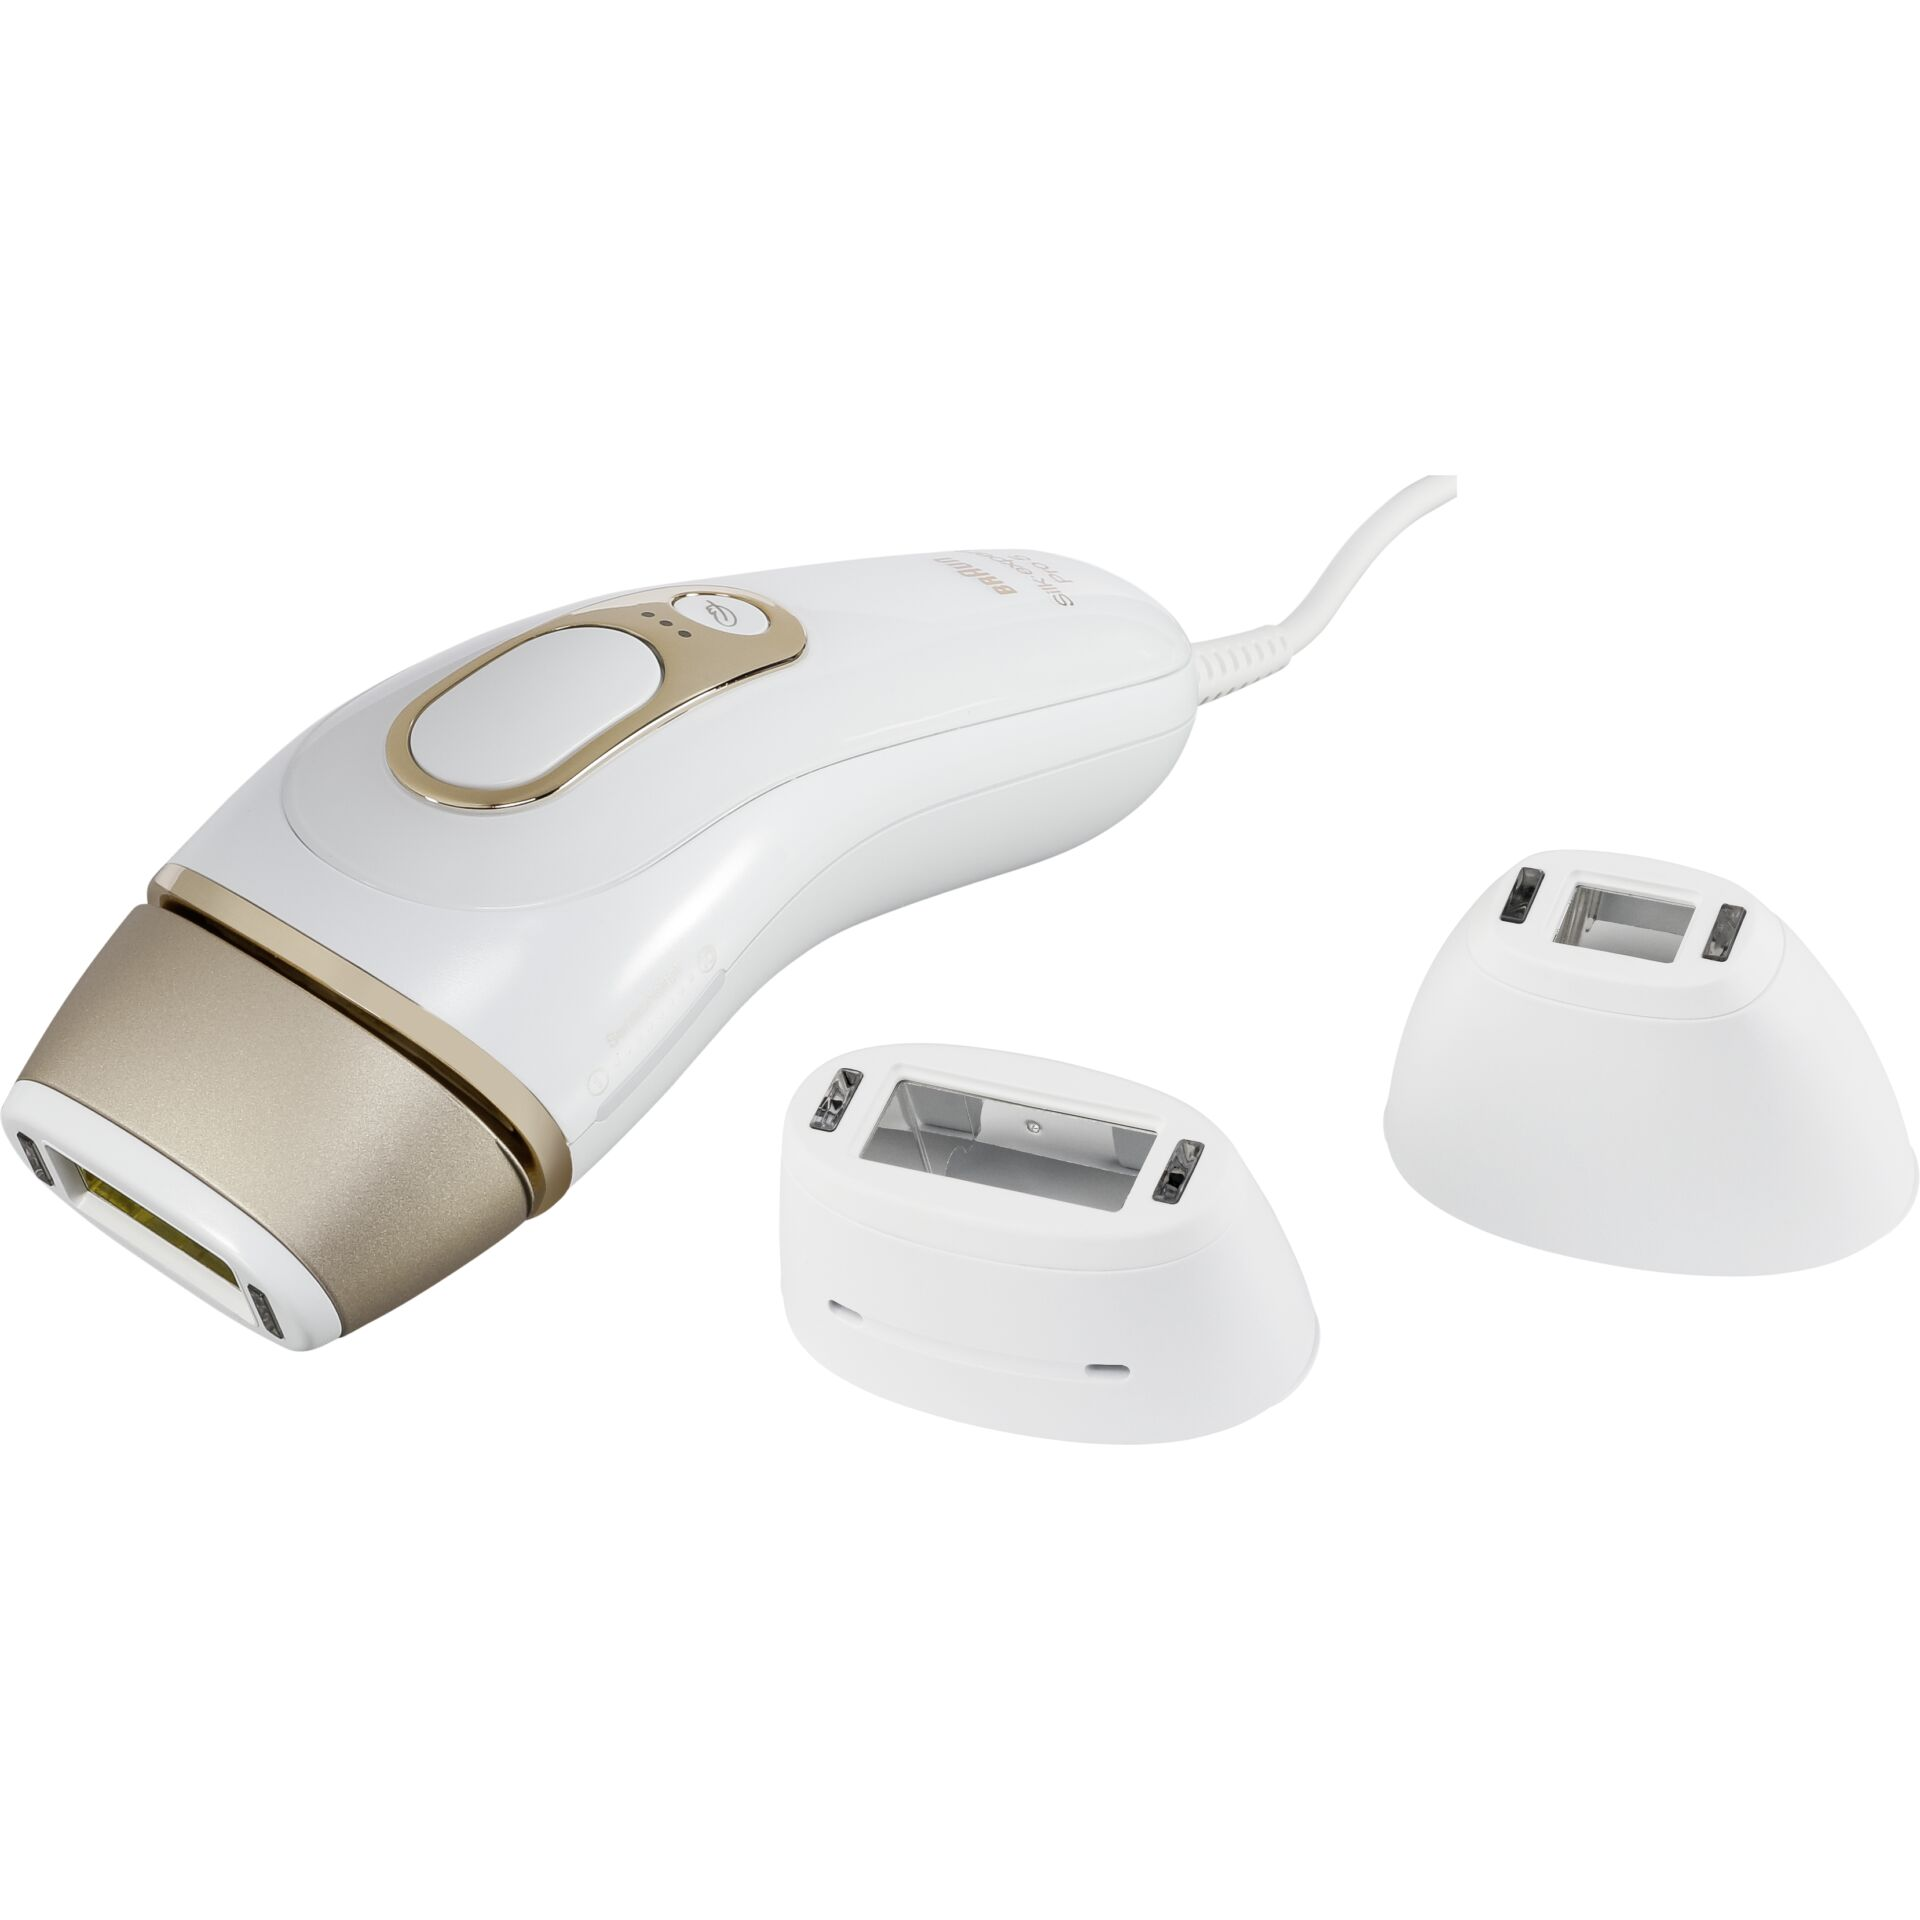 Braun Silk-expert Pro PL 5237